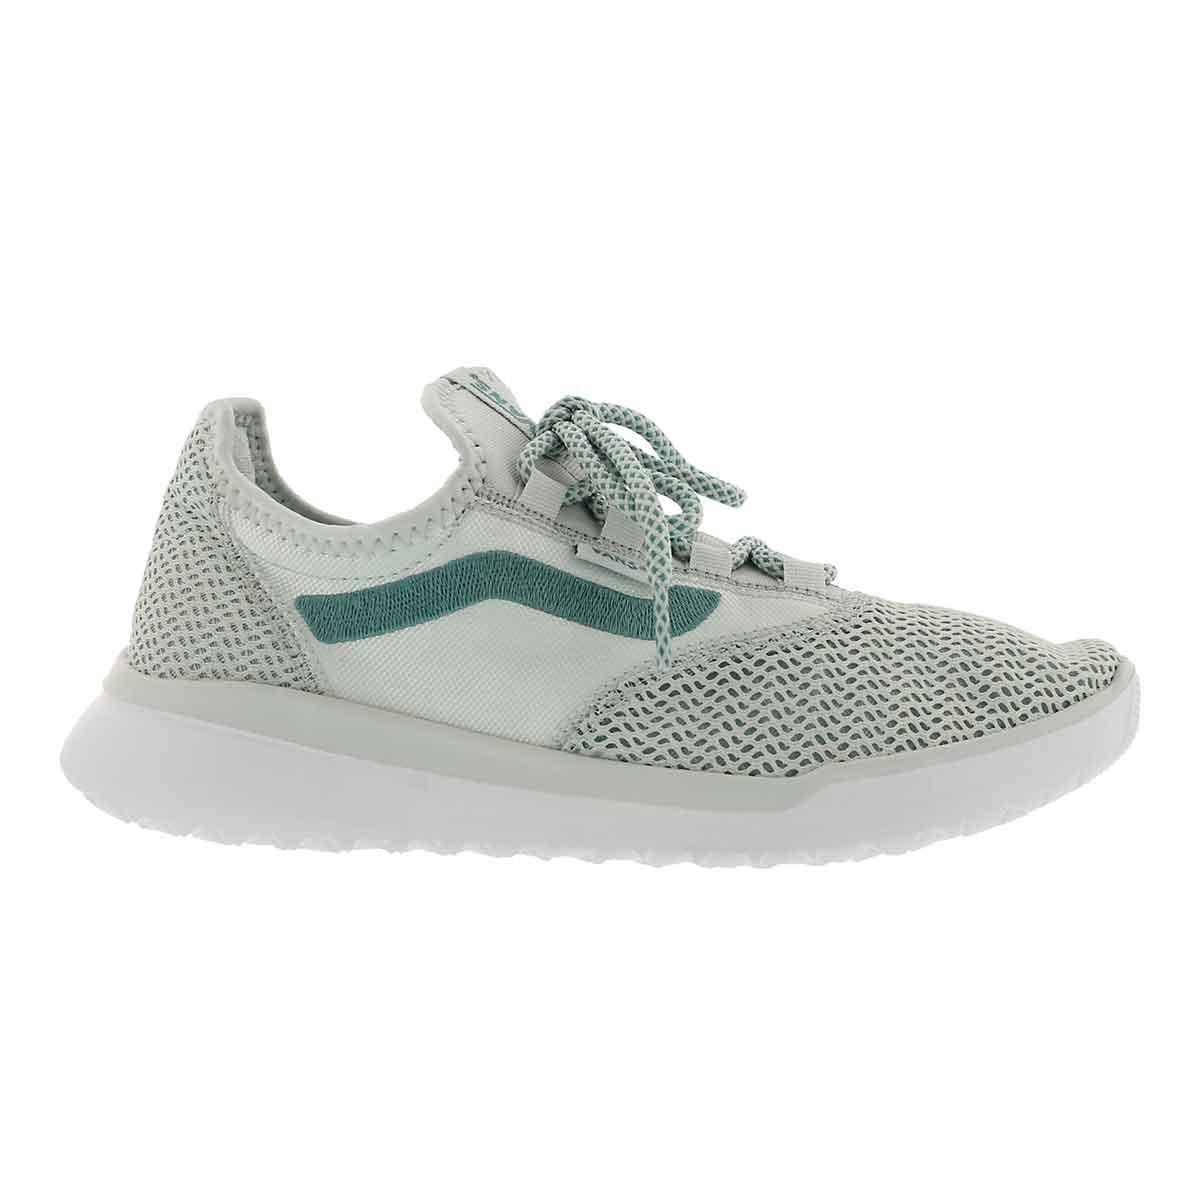 Lds Cerus Lite mint/blu lace up sneaker